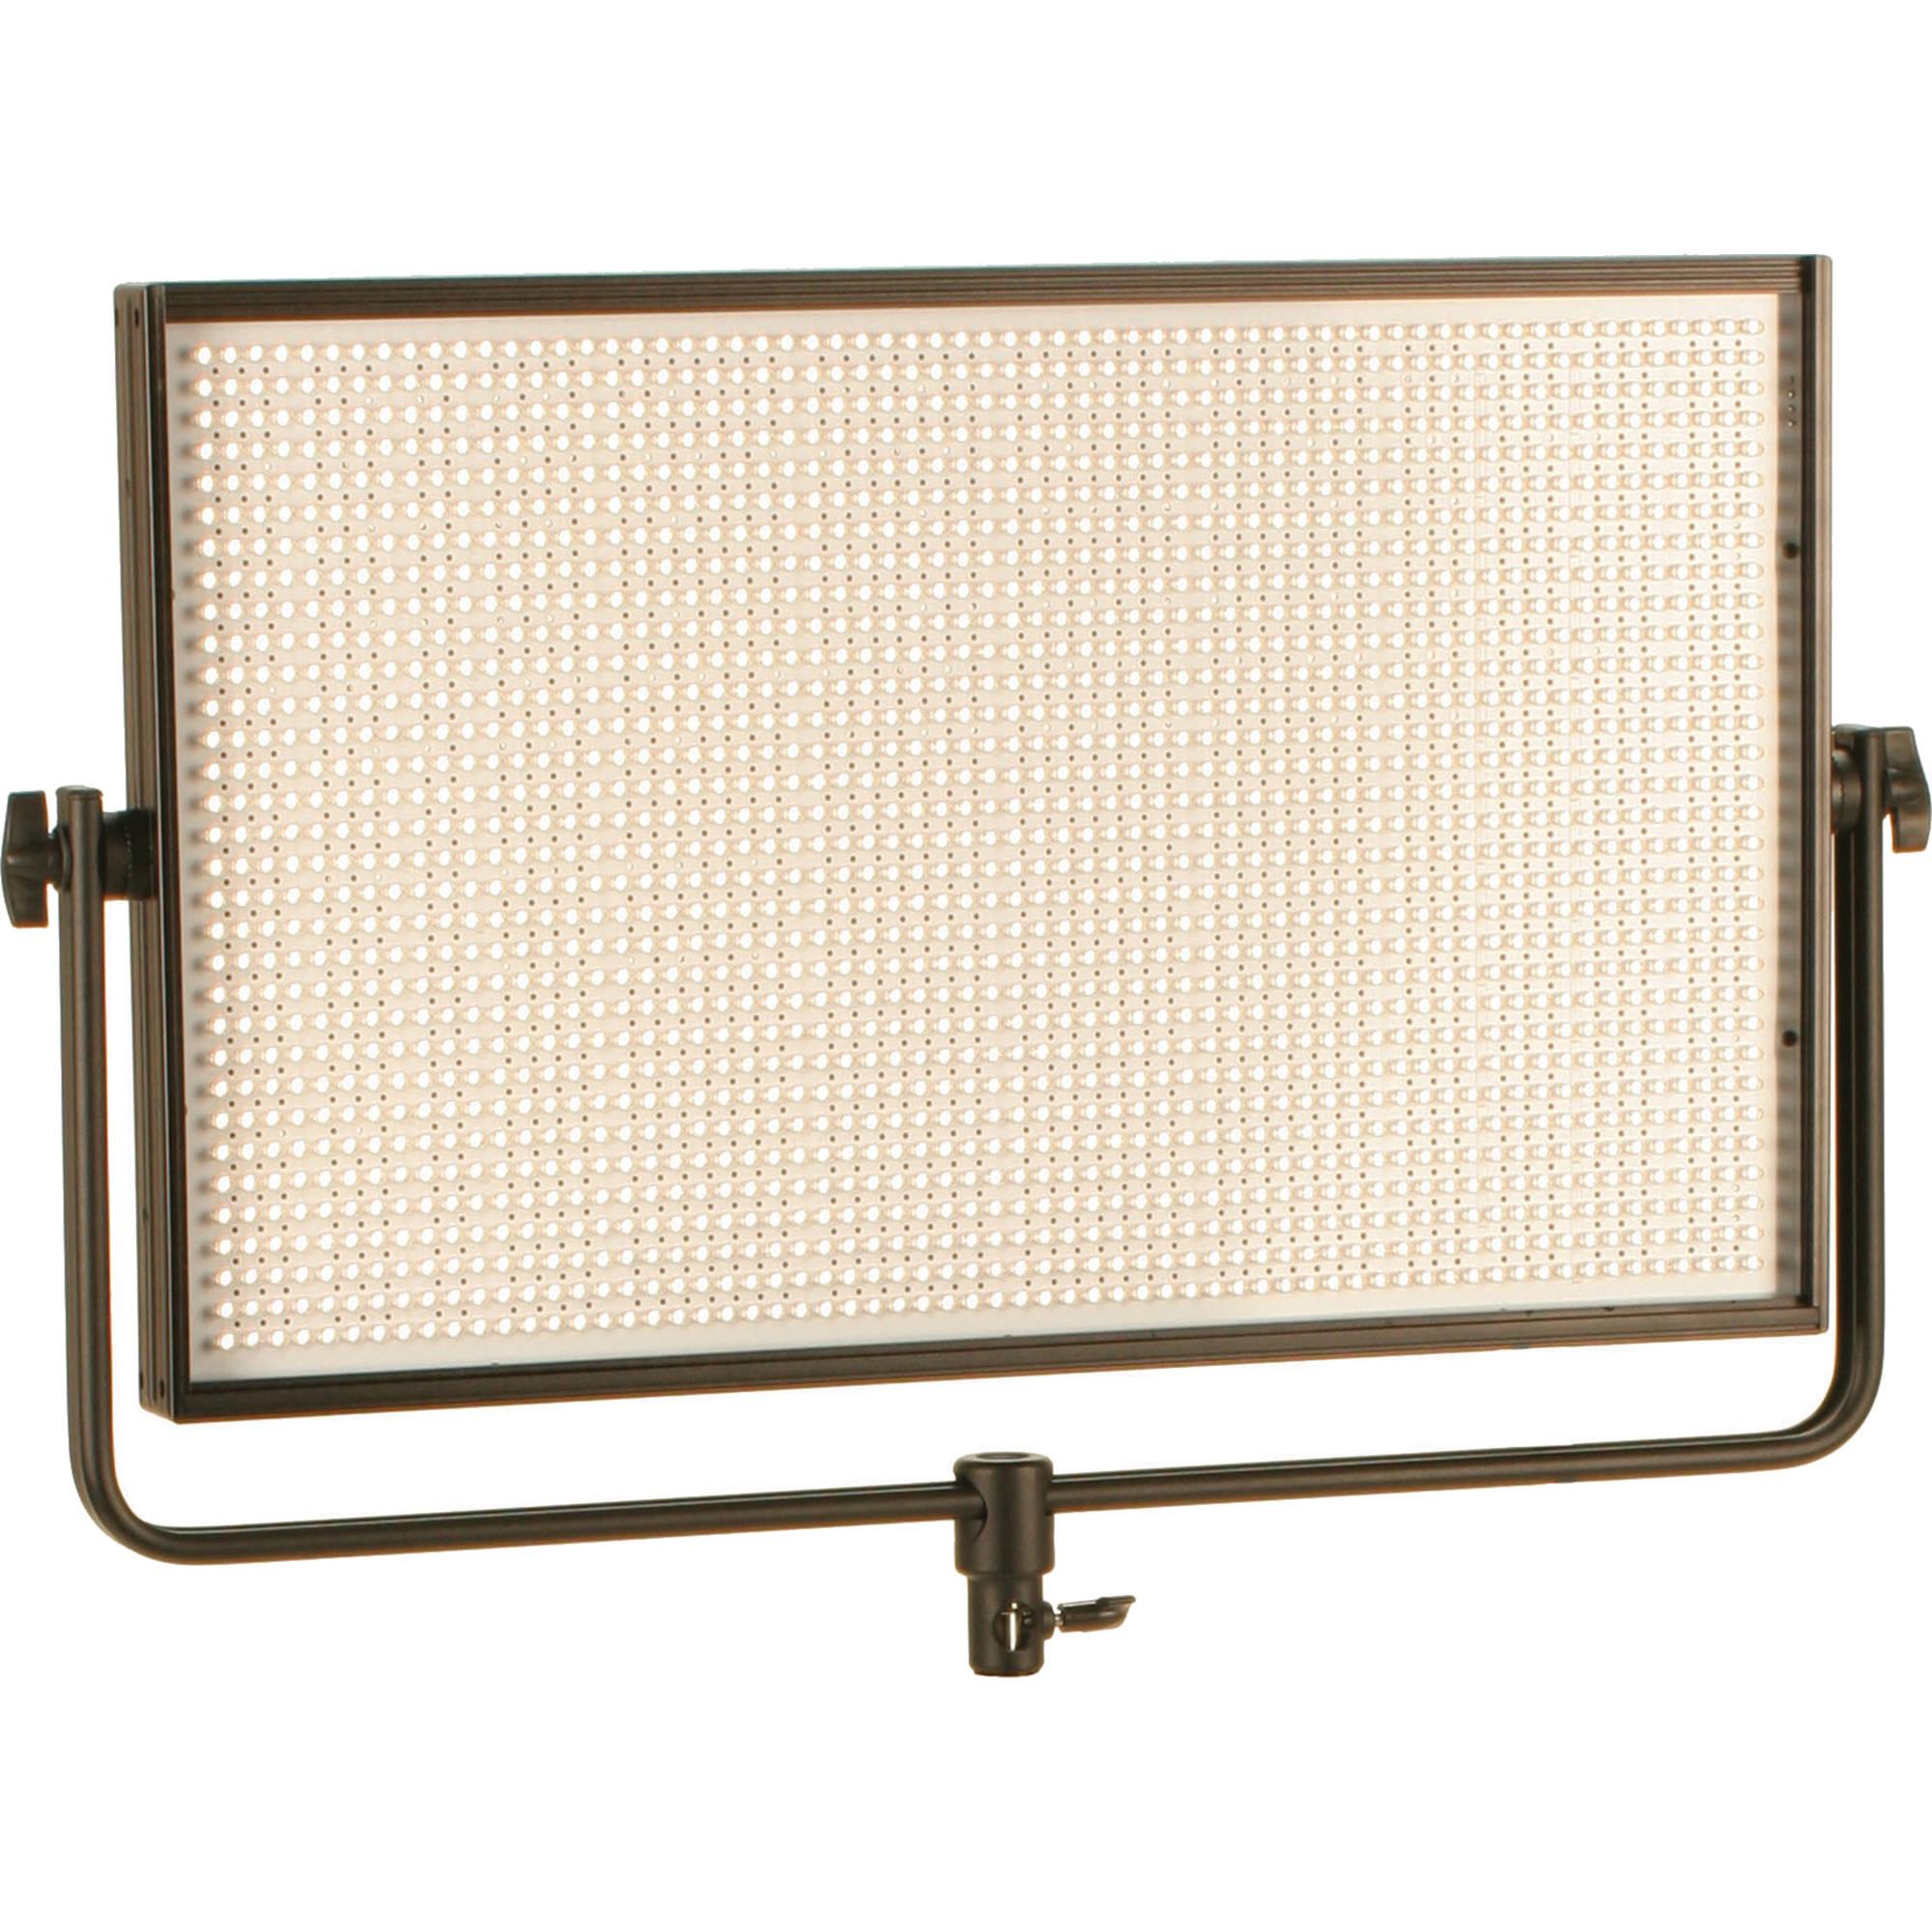 Studio Lux Lighting Design: Cool-Lux CL2000TFX Tungsten PRO Studio LED Flood Light 950323